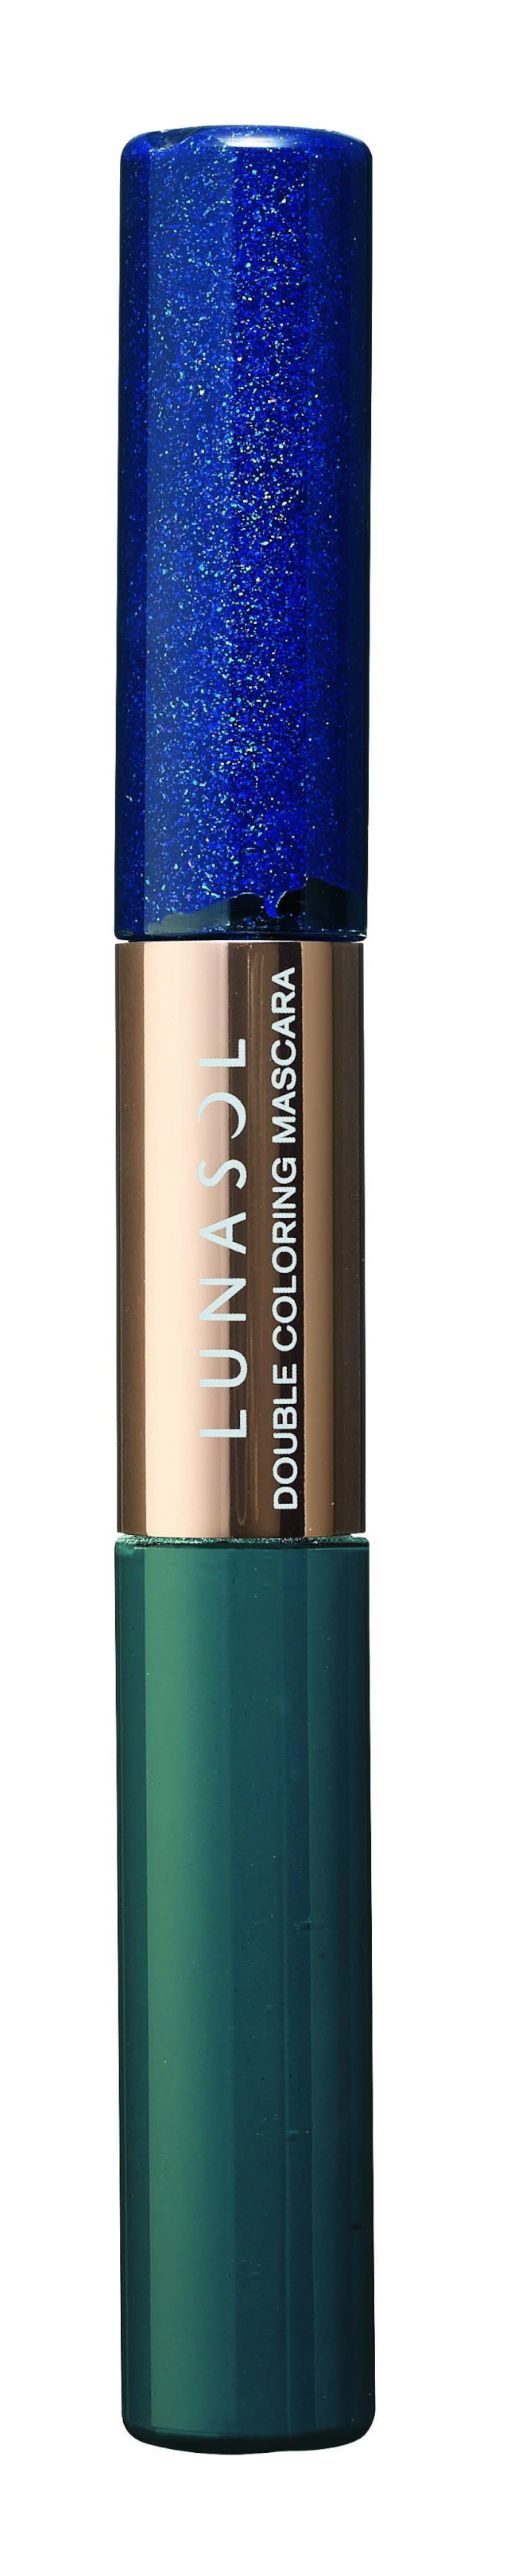 Kanebo LUNASOL「燦麗淨化─夏限定」雙采拚色睫毛膏。(圖:Kanebo提供)